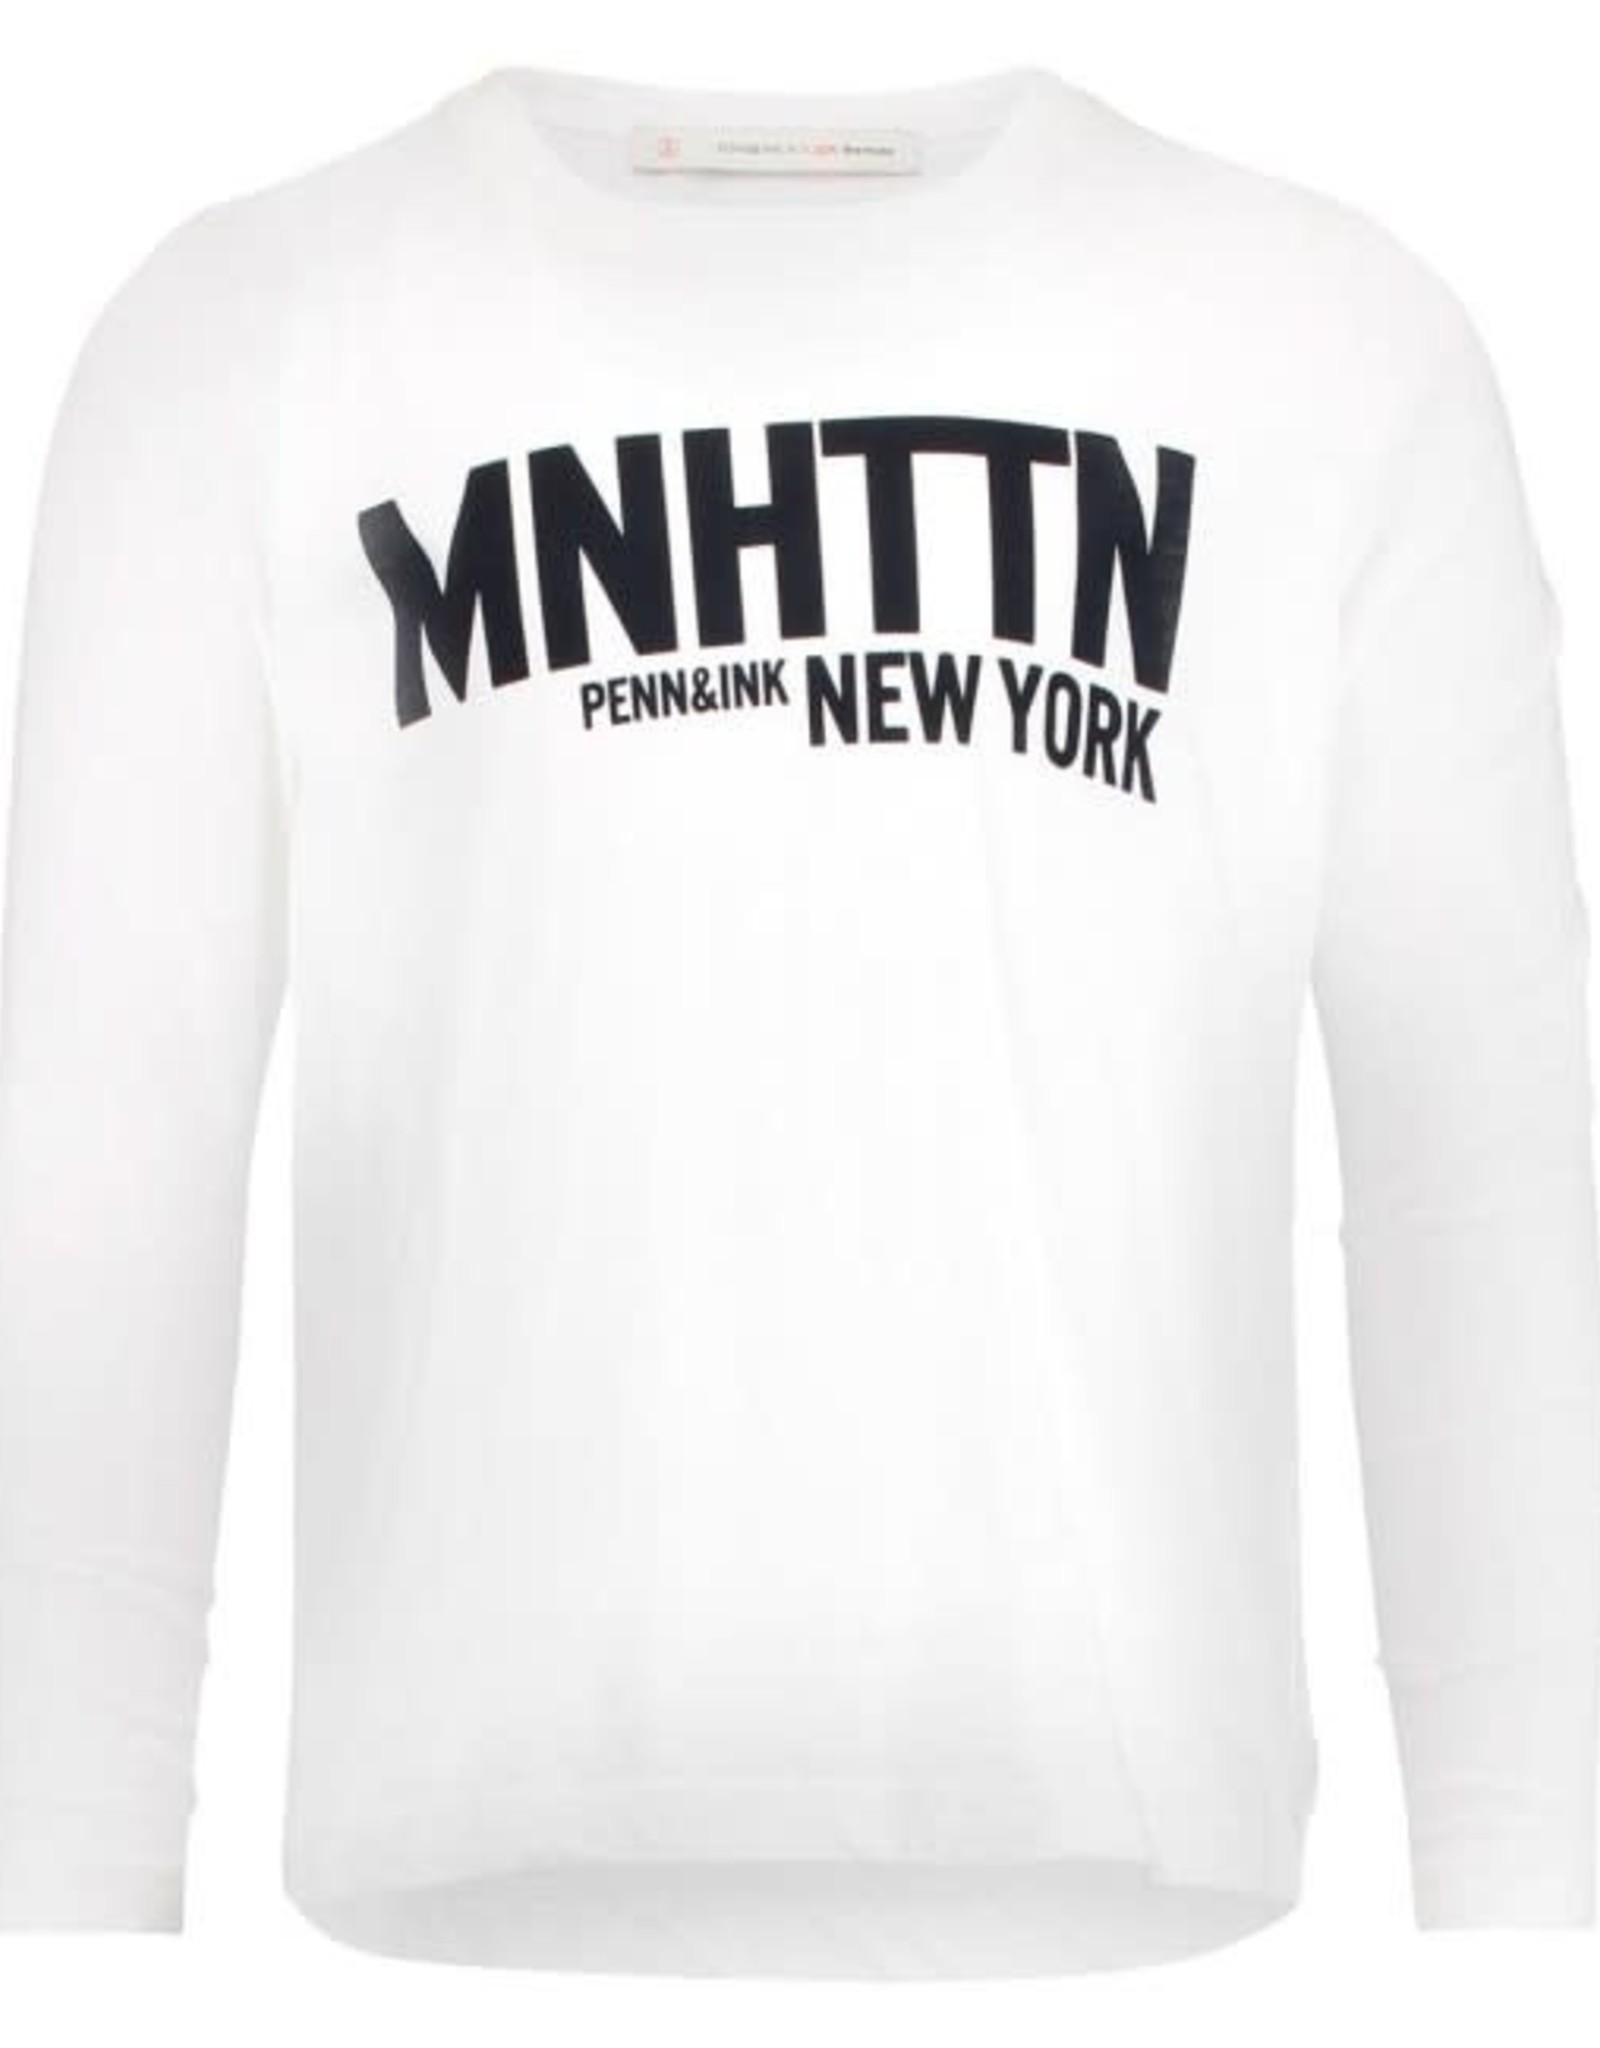 Penn & Ink N.Y. Longsleeve MNHTTN White/Navy mt 6